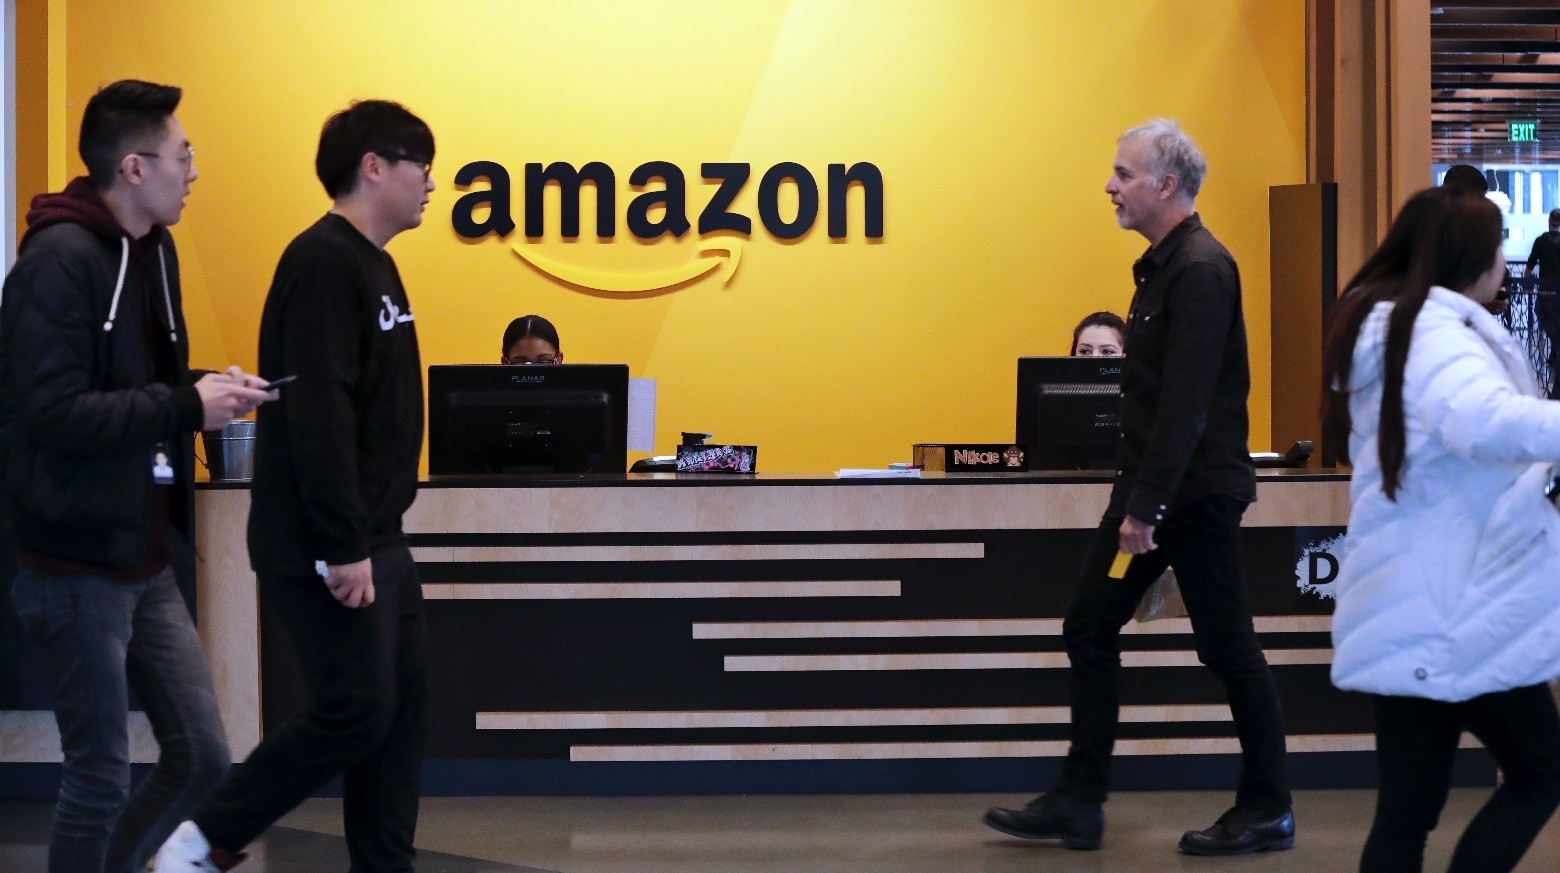 Employees walk through a lobby at Amazonu2019s headquarters, Seattle, Nov. 13.